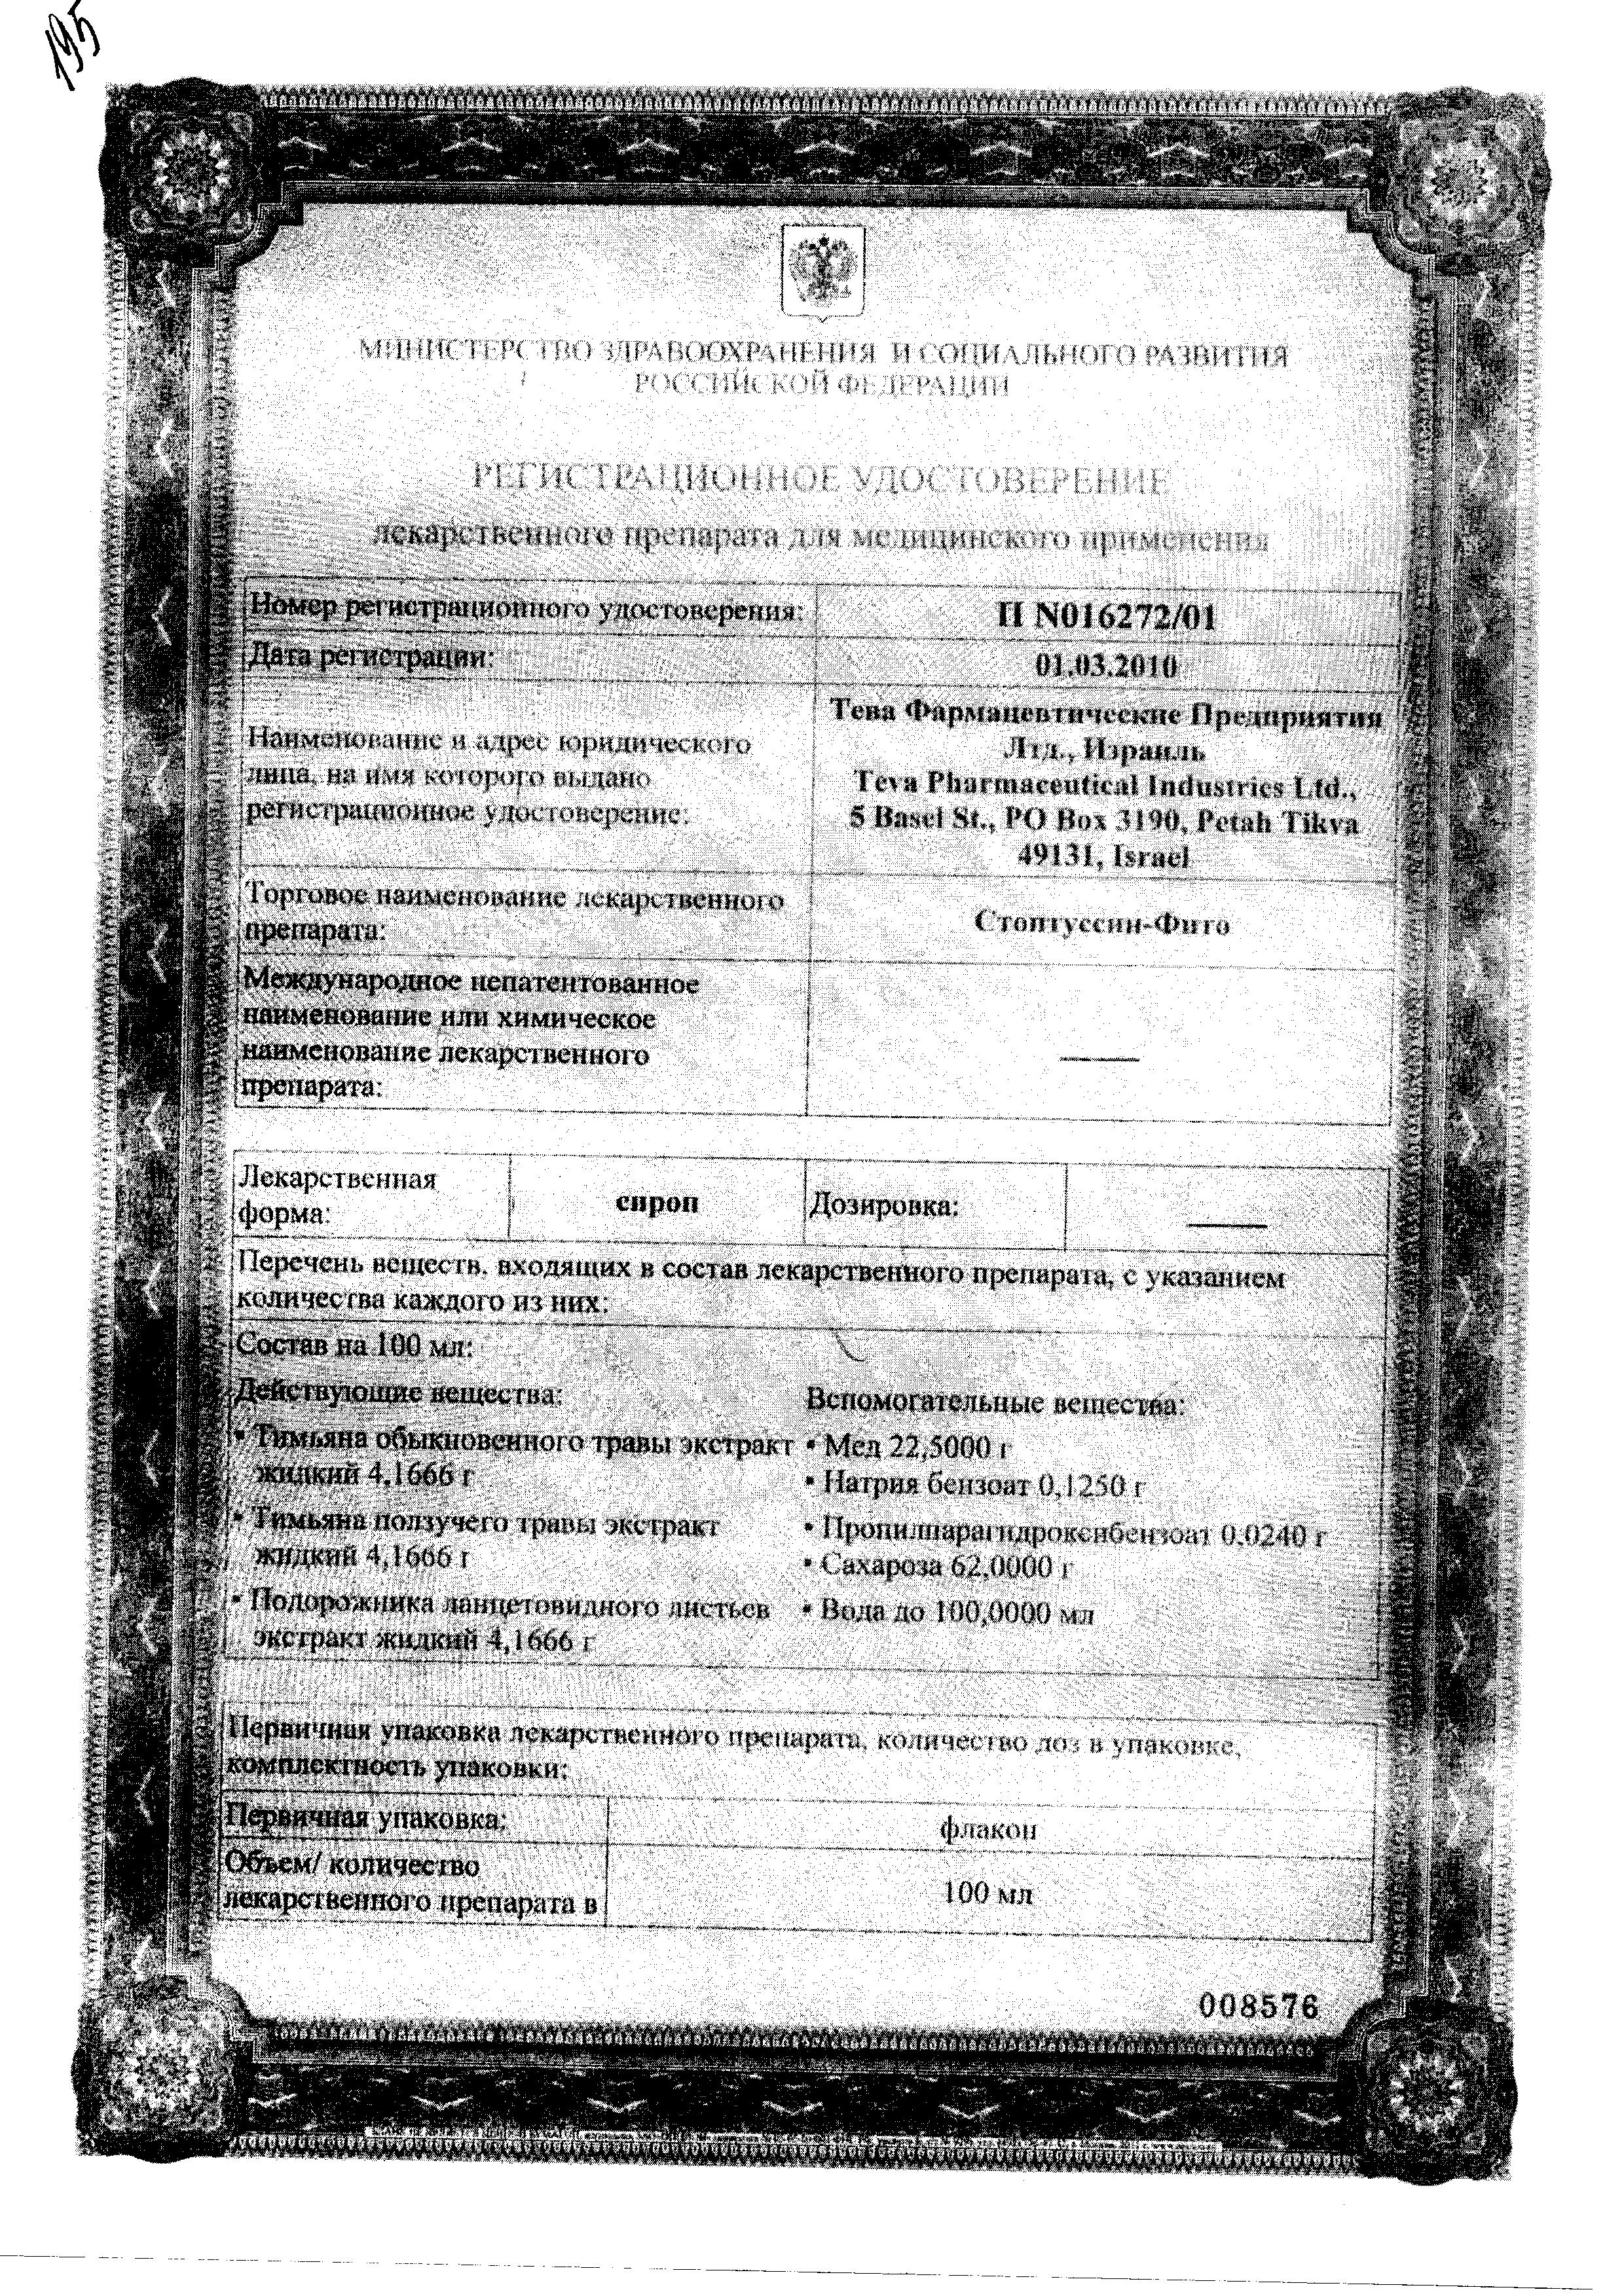 Стоптуссин-Фито сертификат